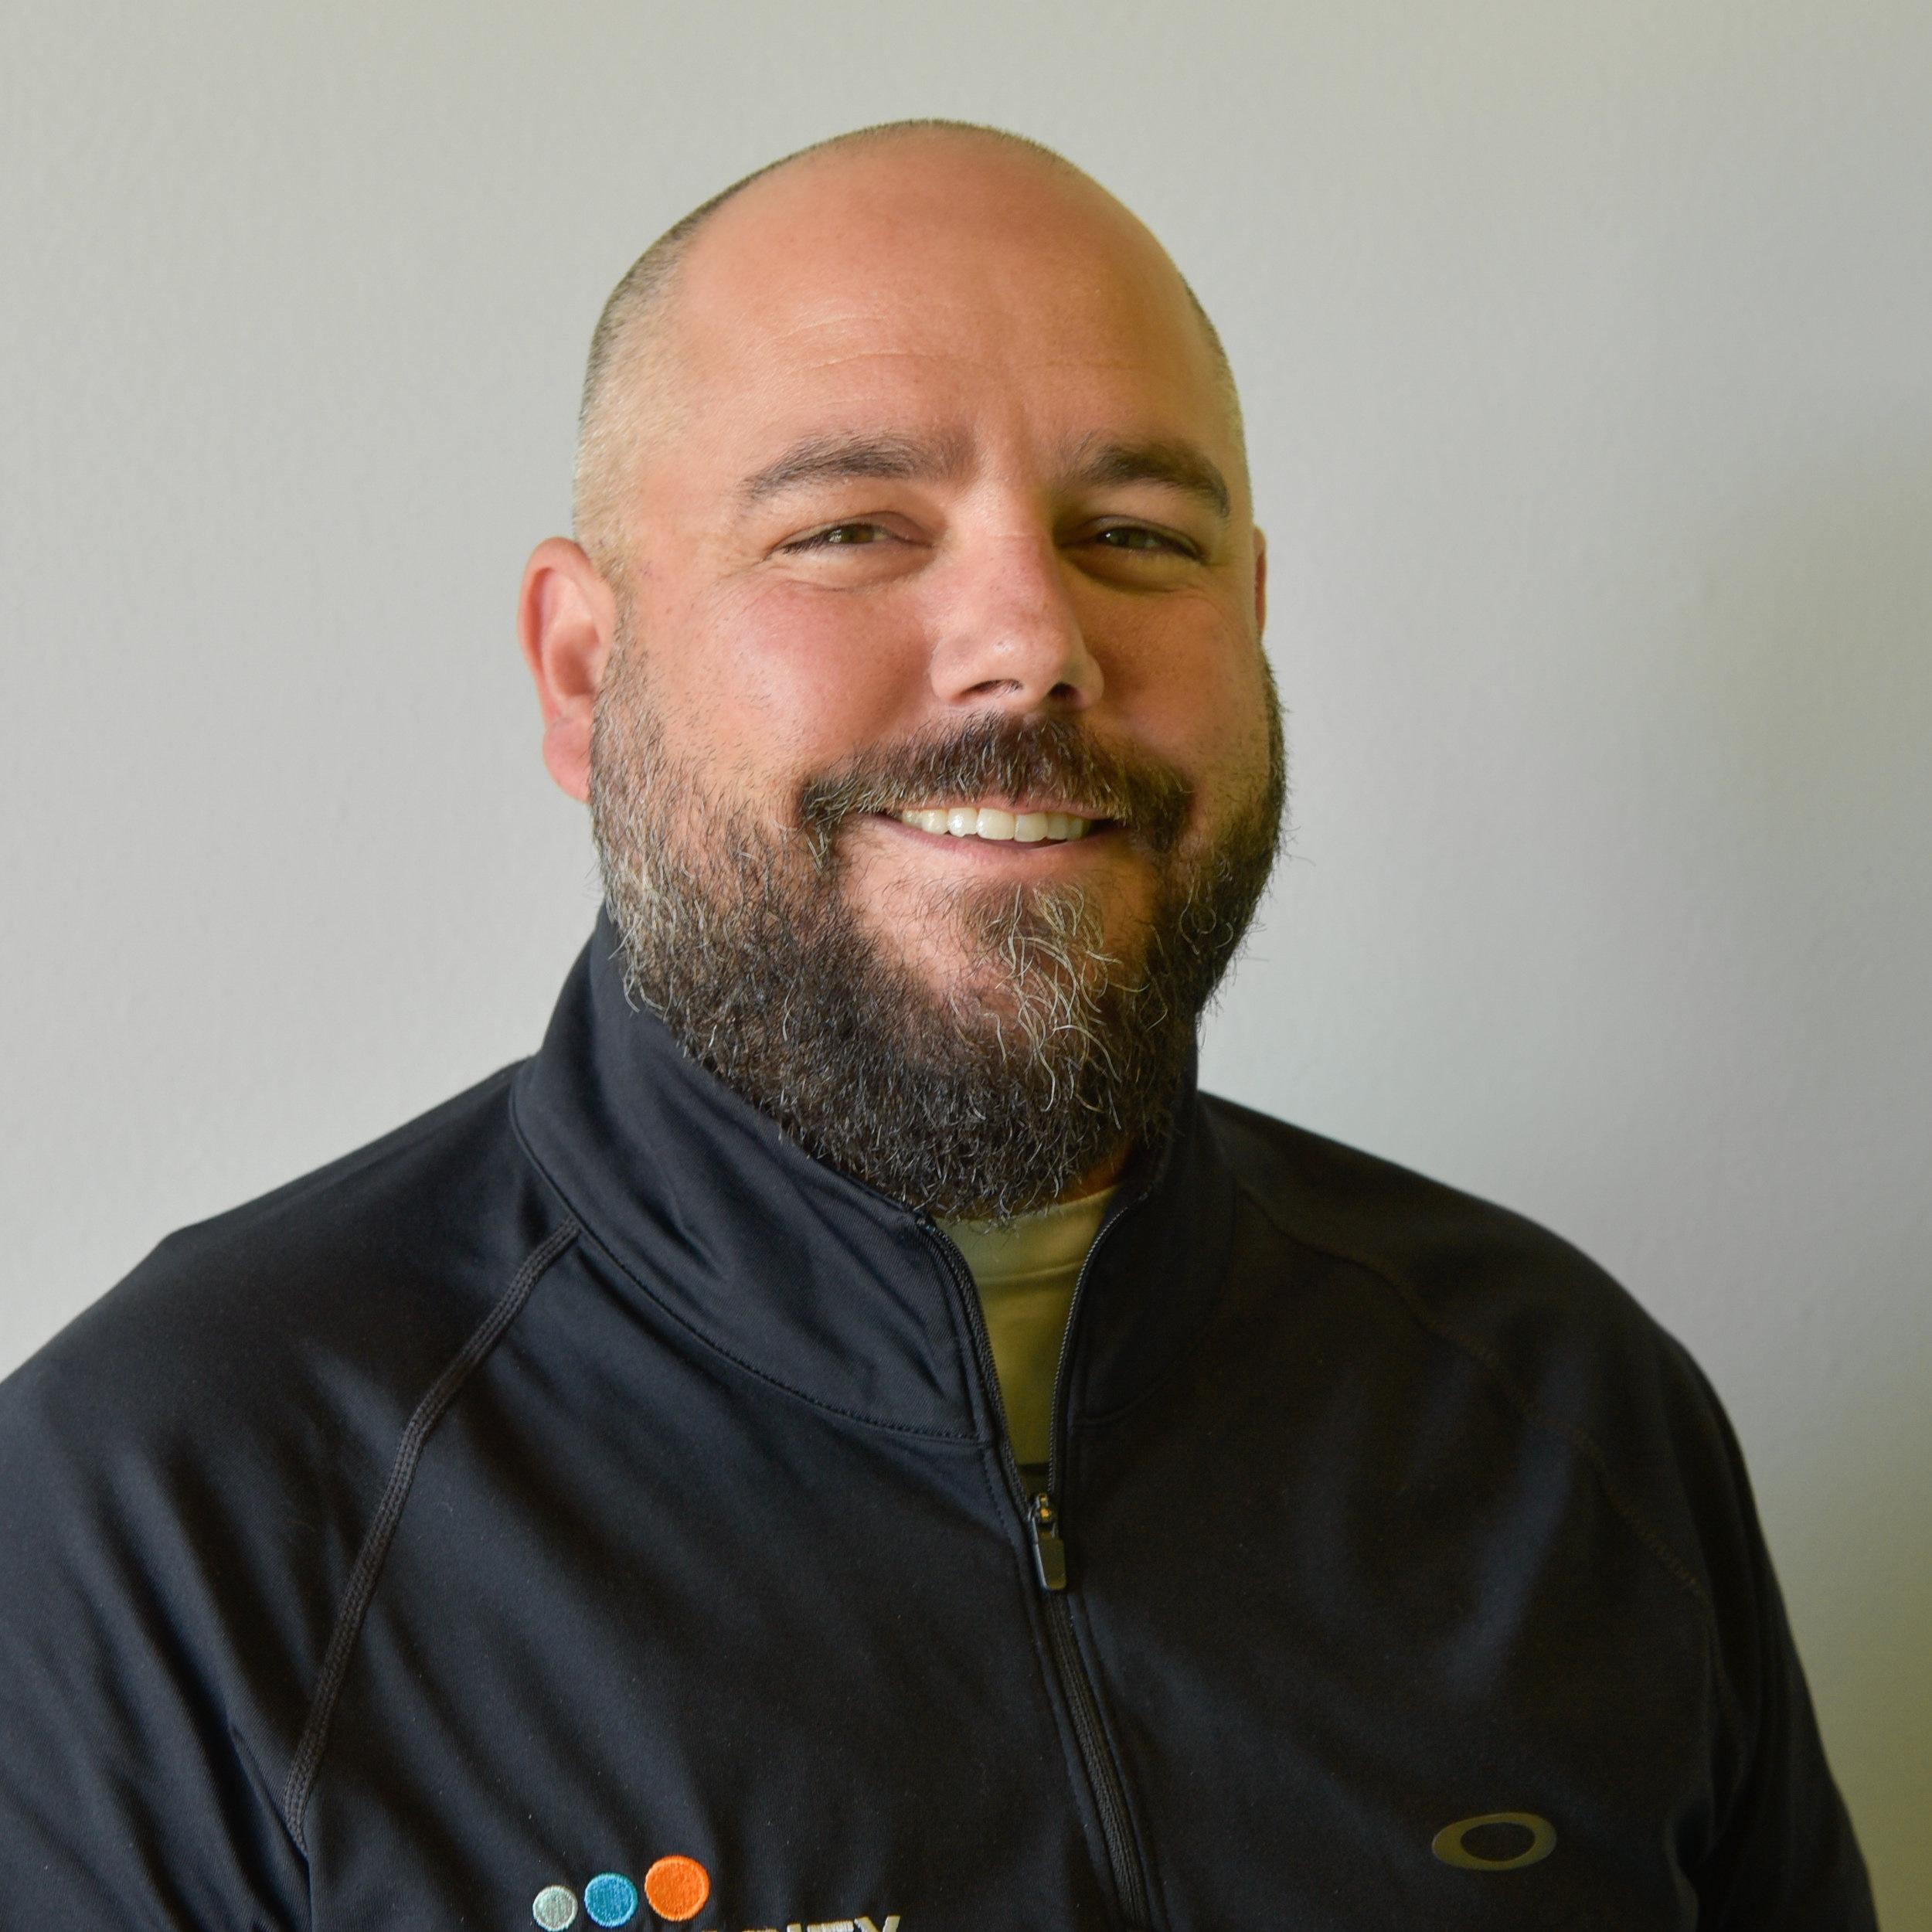 Matt Miller - LEAD PASTORCentral Role